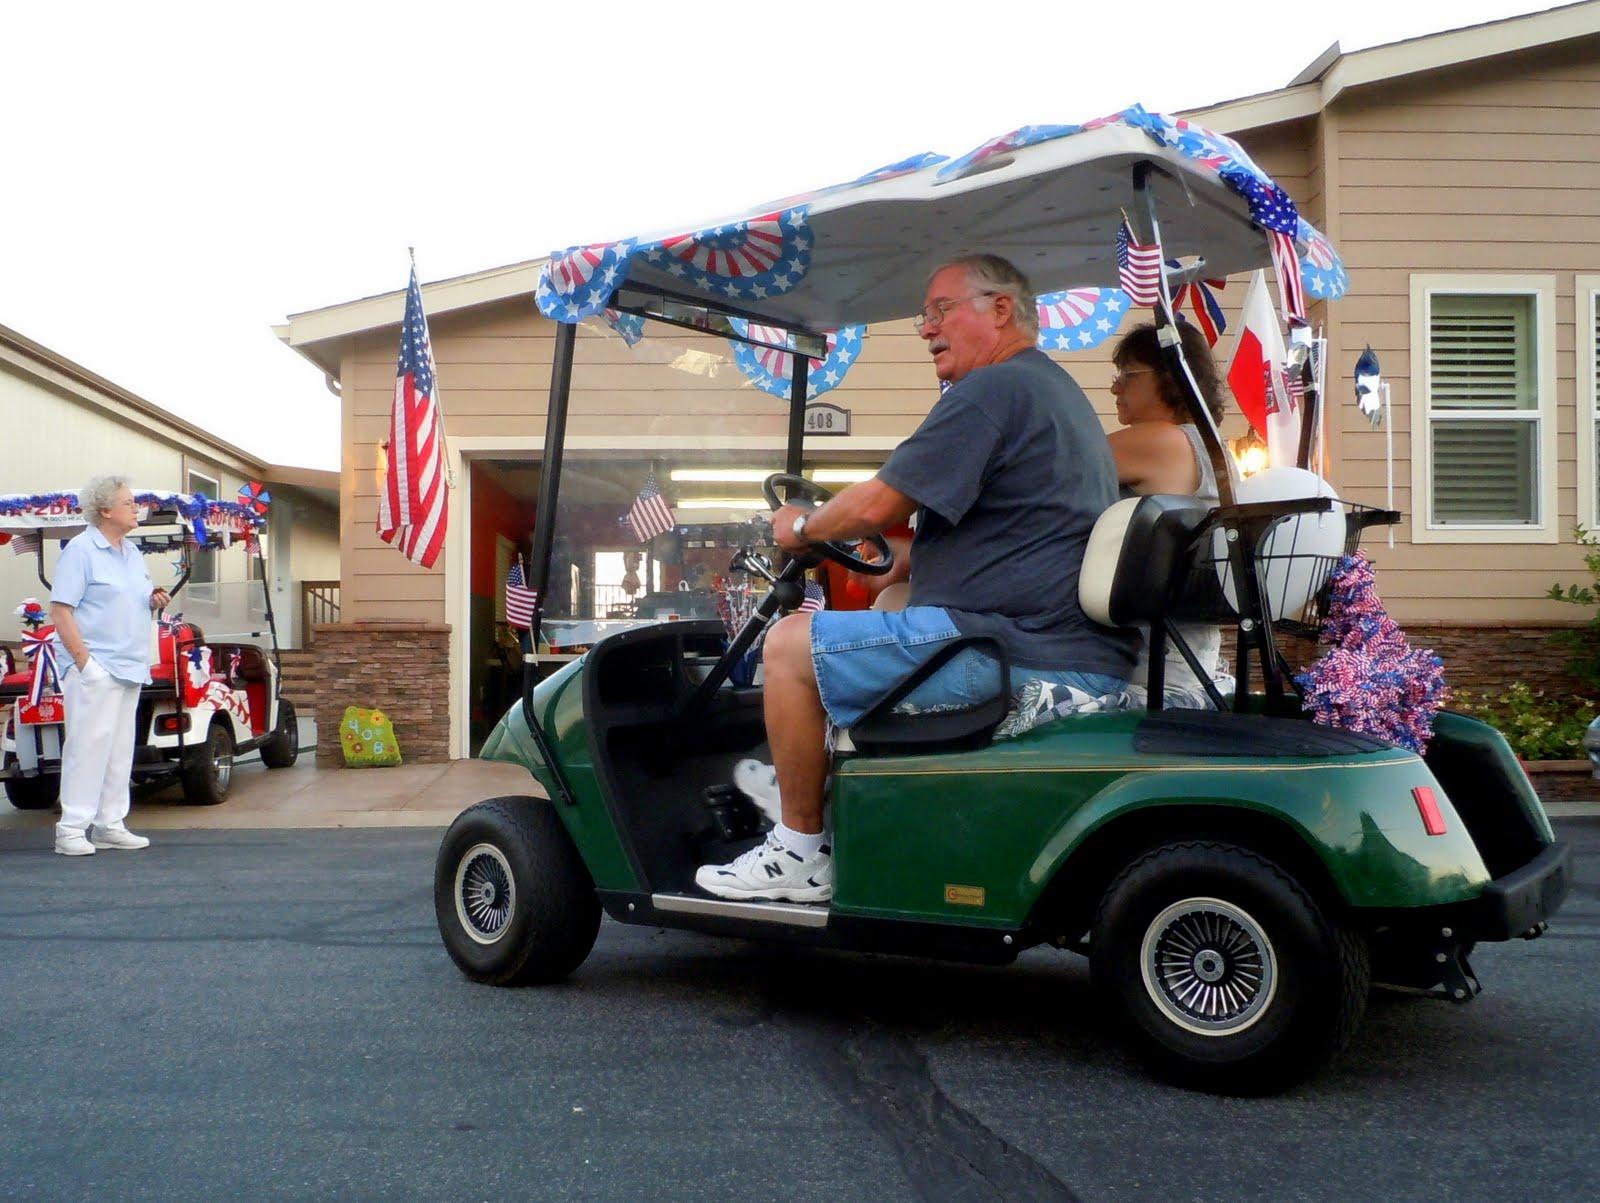 Surviving Oakridge: July 2011 on decorate a 4 wheeler, halloween decorating ideas golf cart, decorate a wheelchair, decorate a shopping cart,